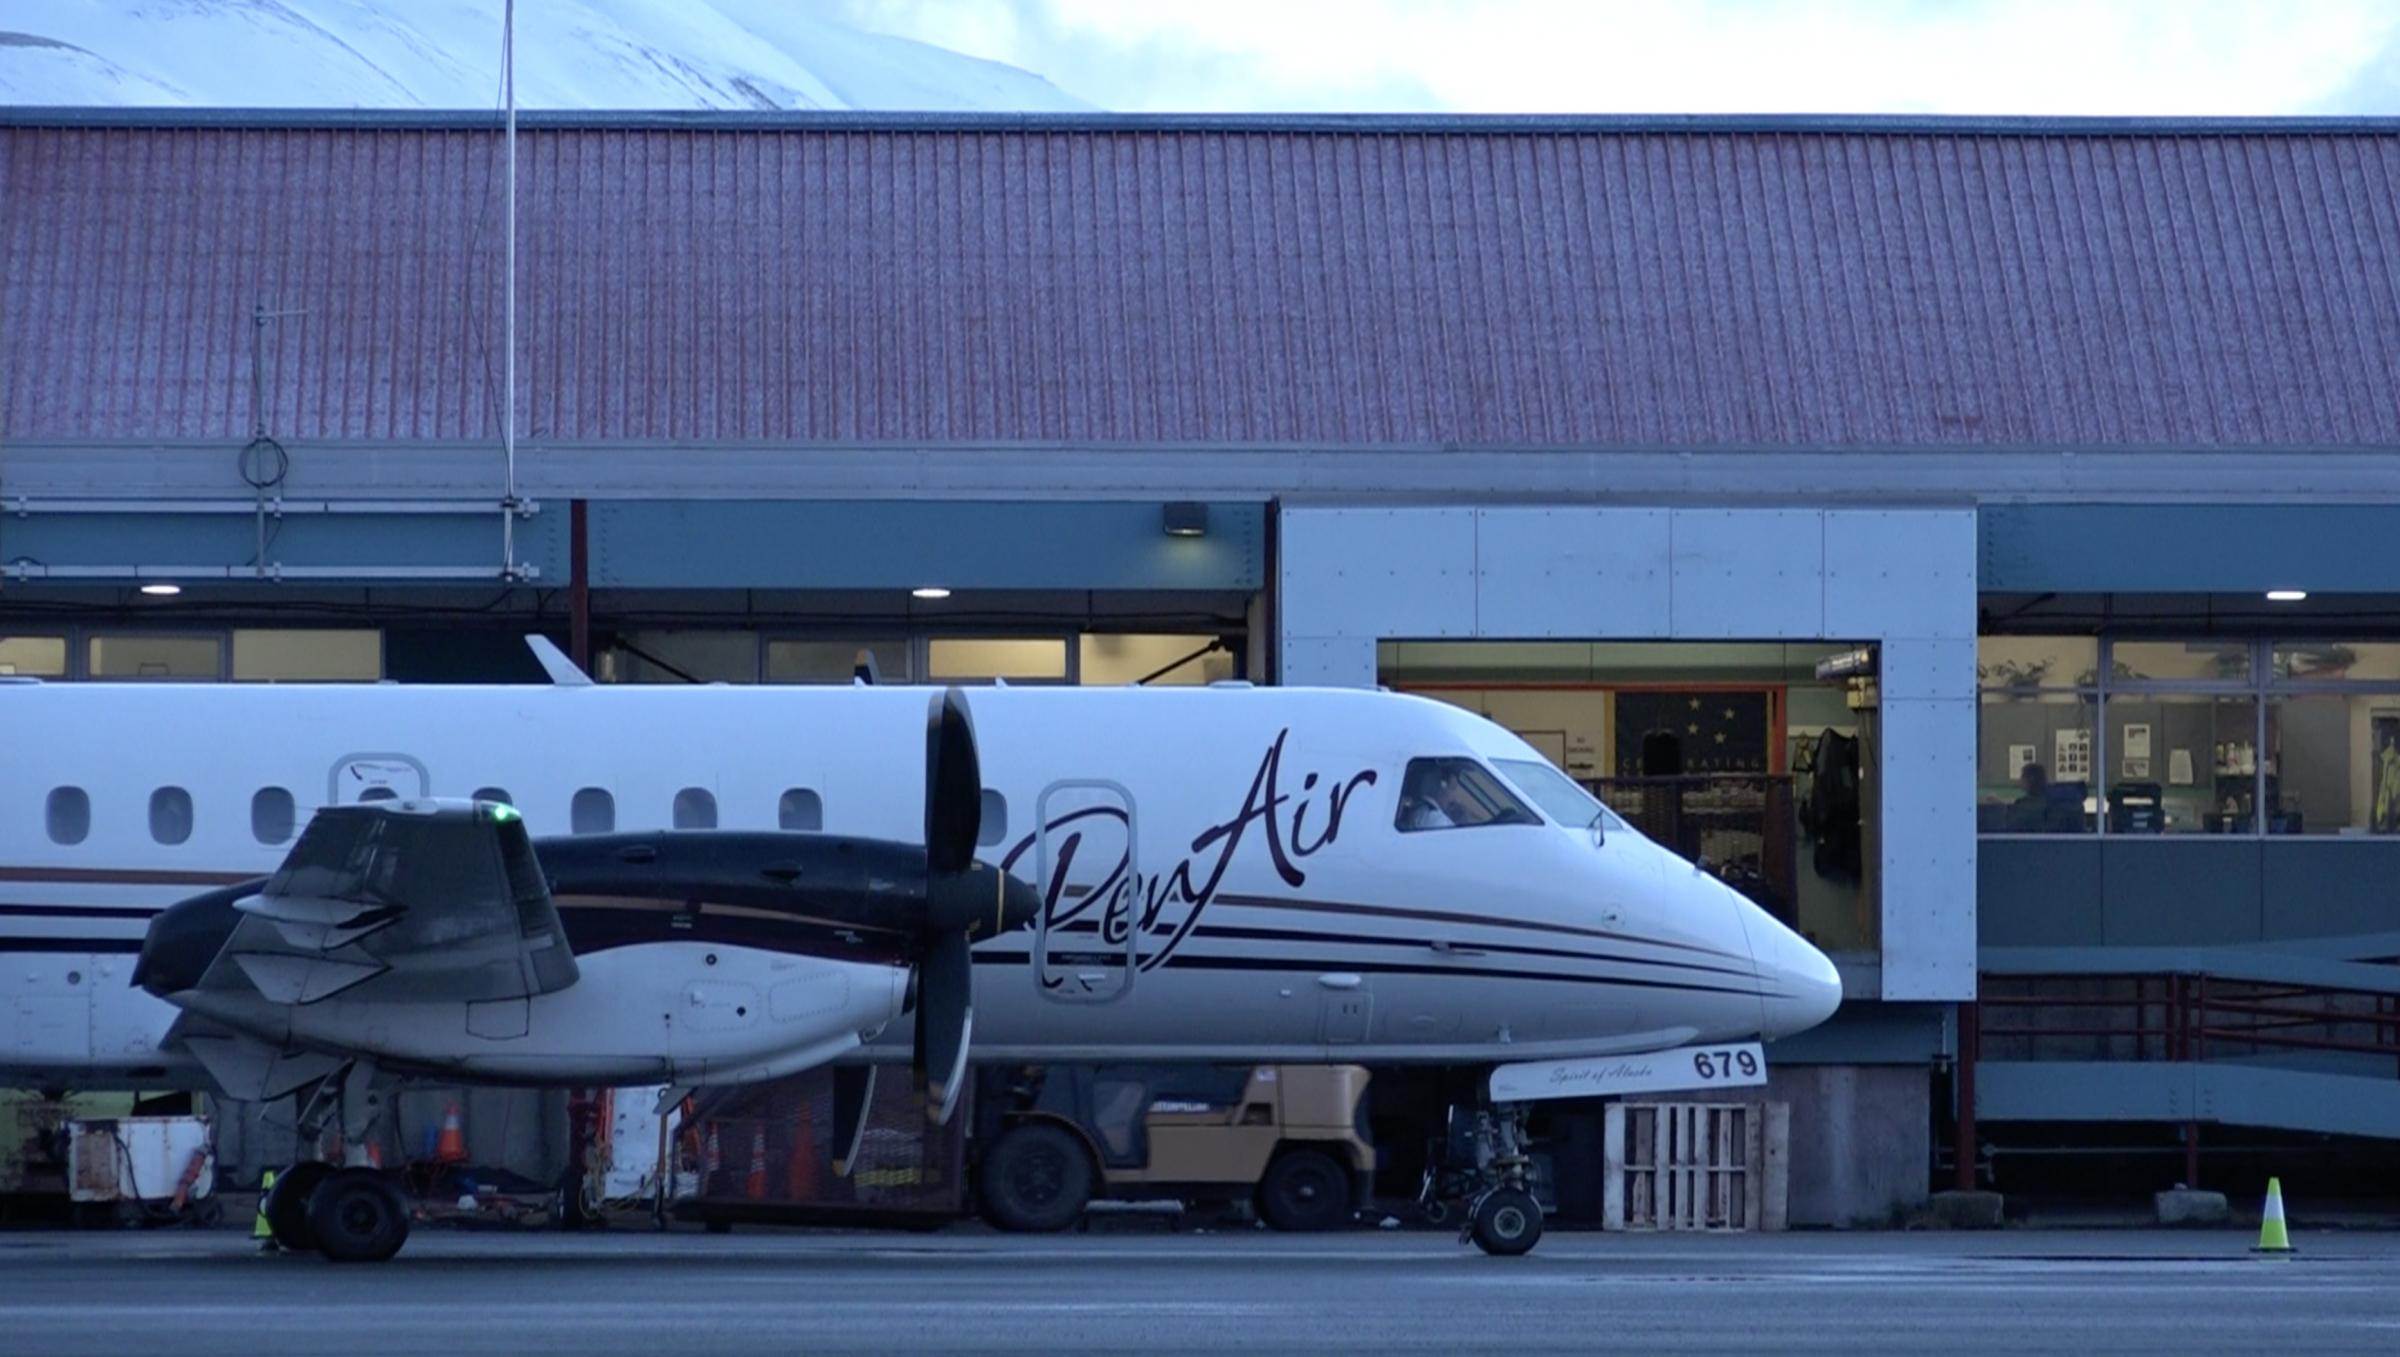 Passenger Flights Resume In Unalaska After 4 Days Of Cancellations